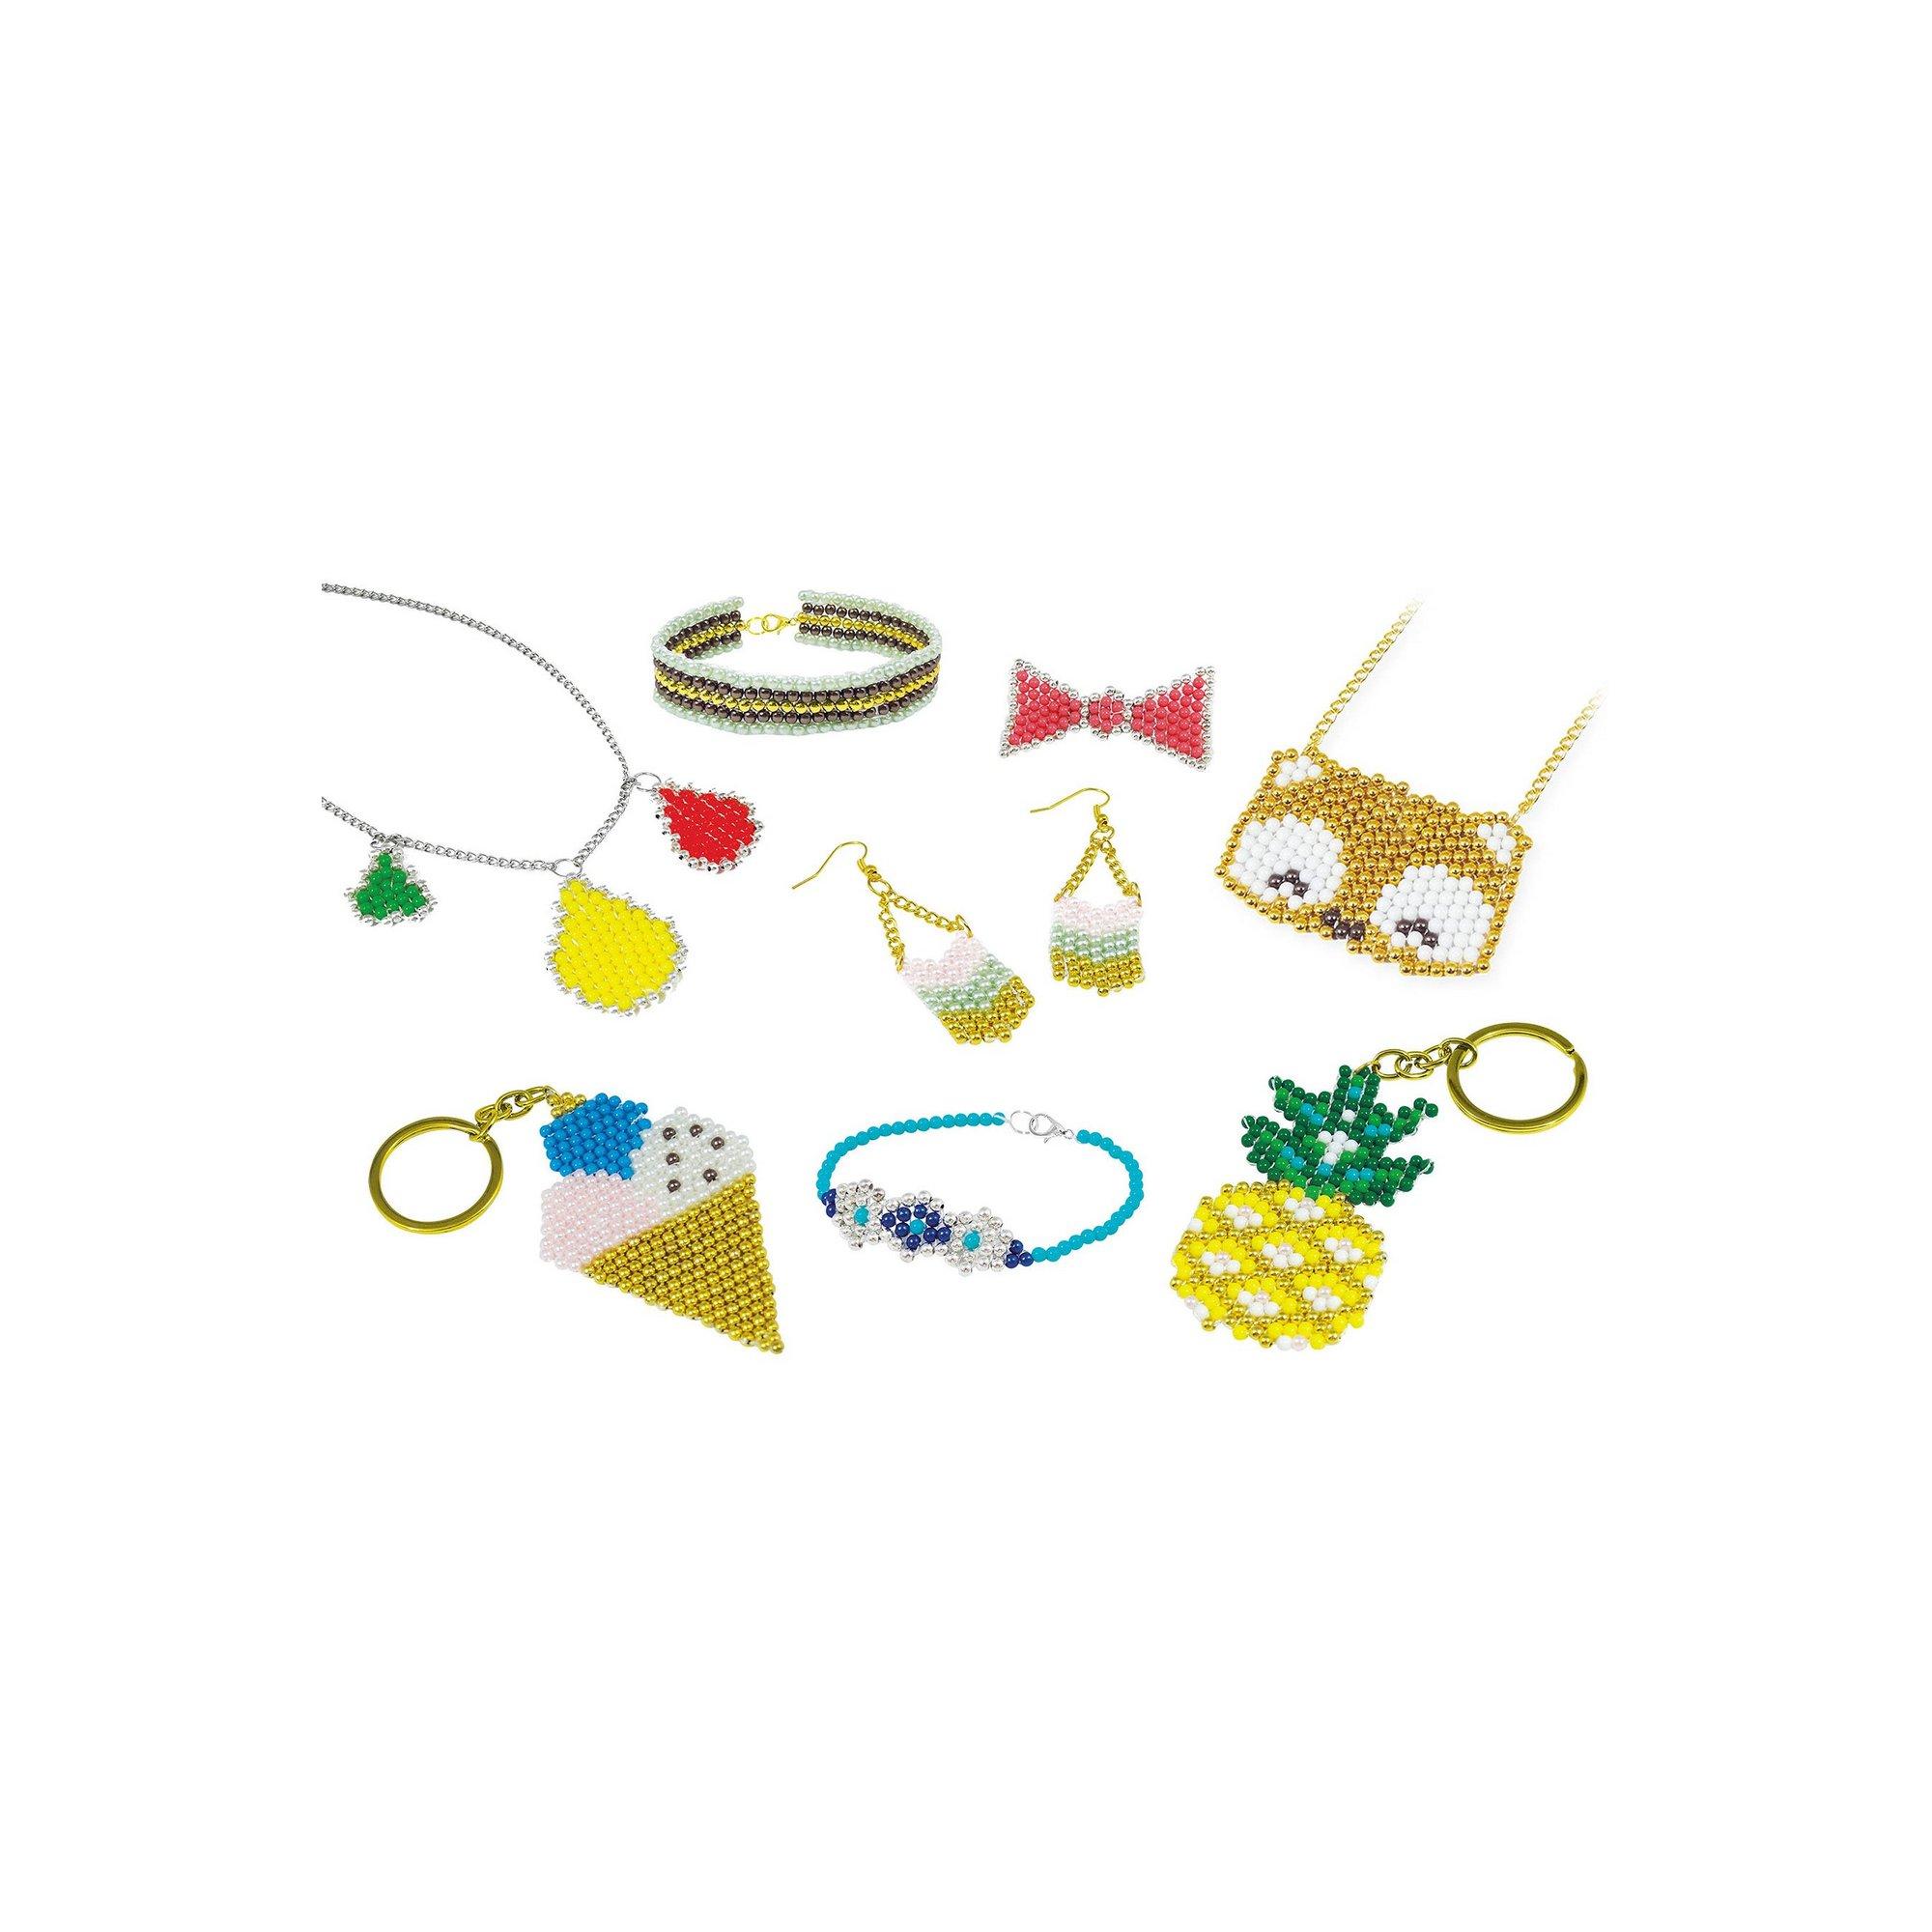 Image of Be Teens Woven Jewellery Set